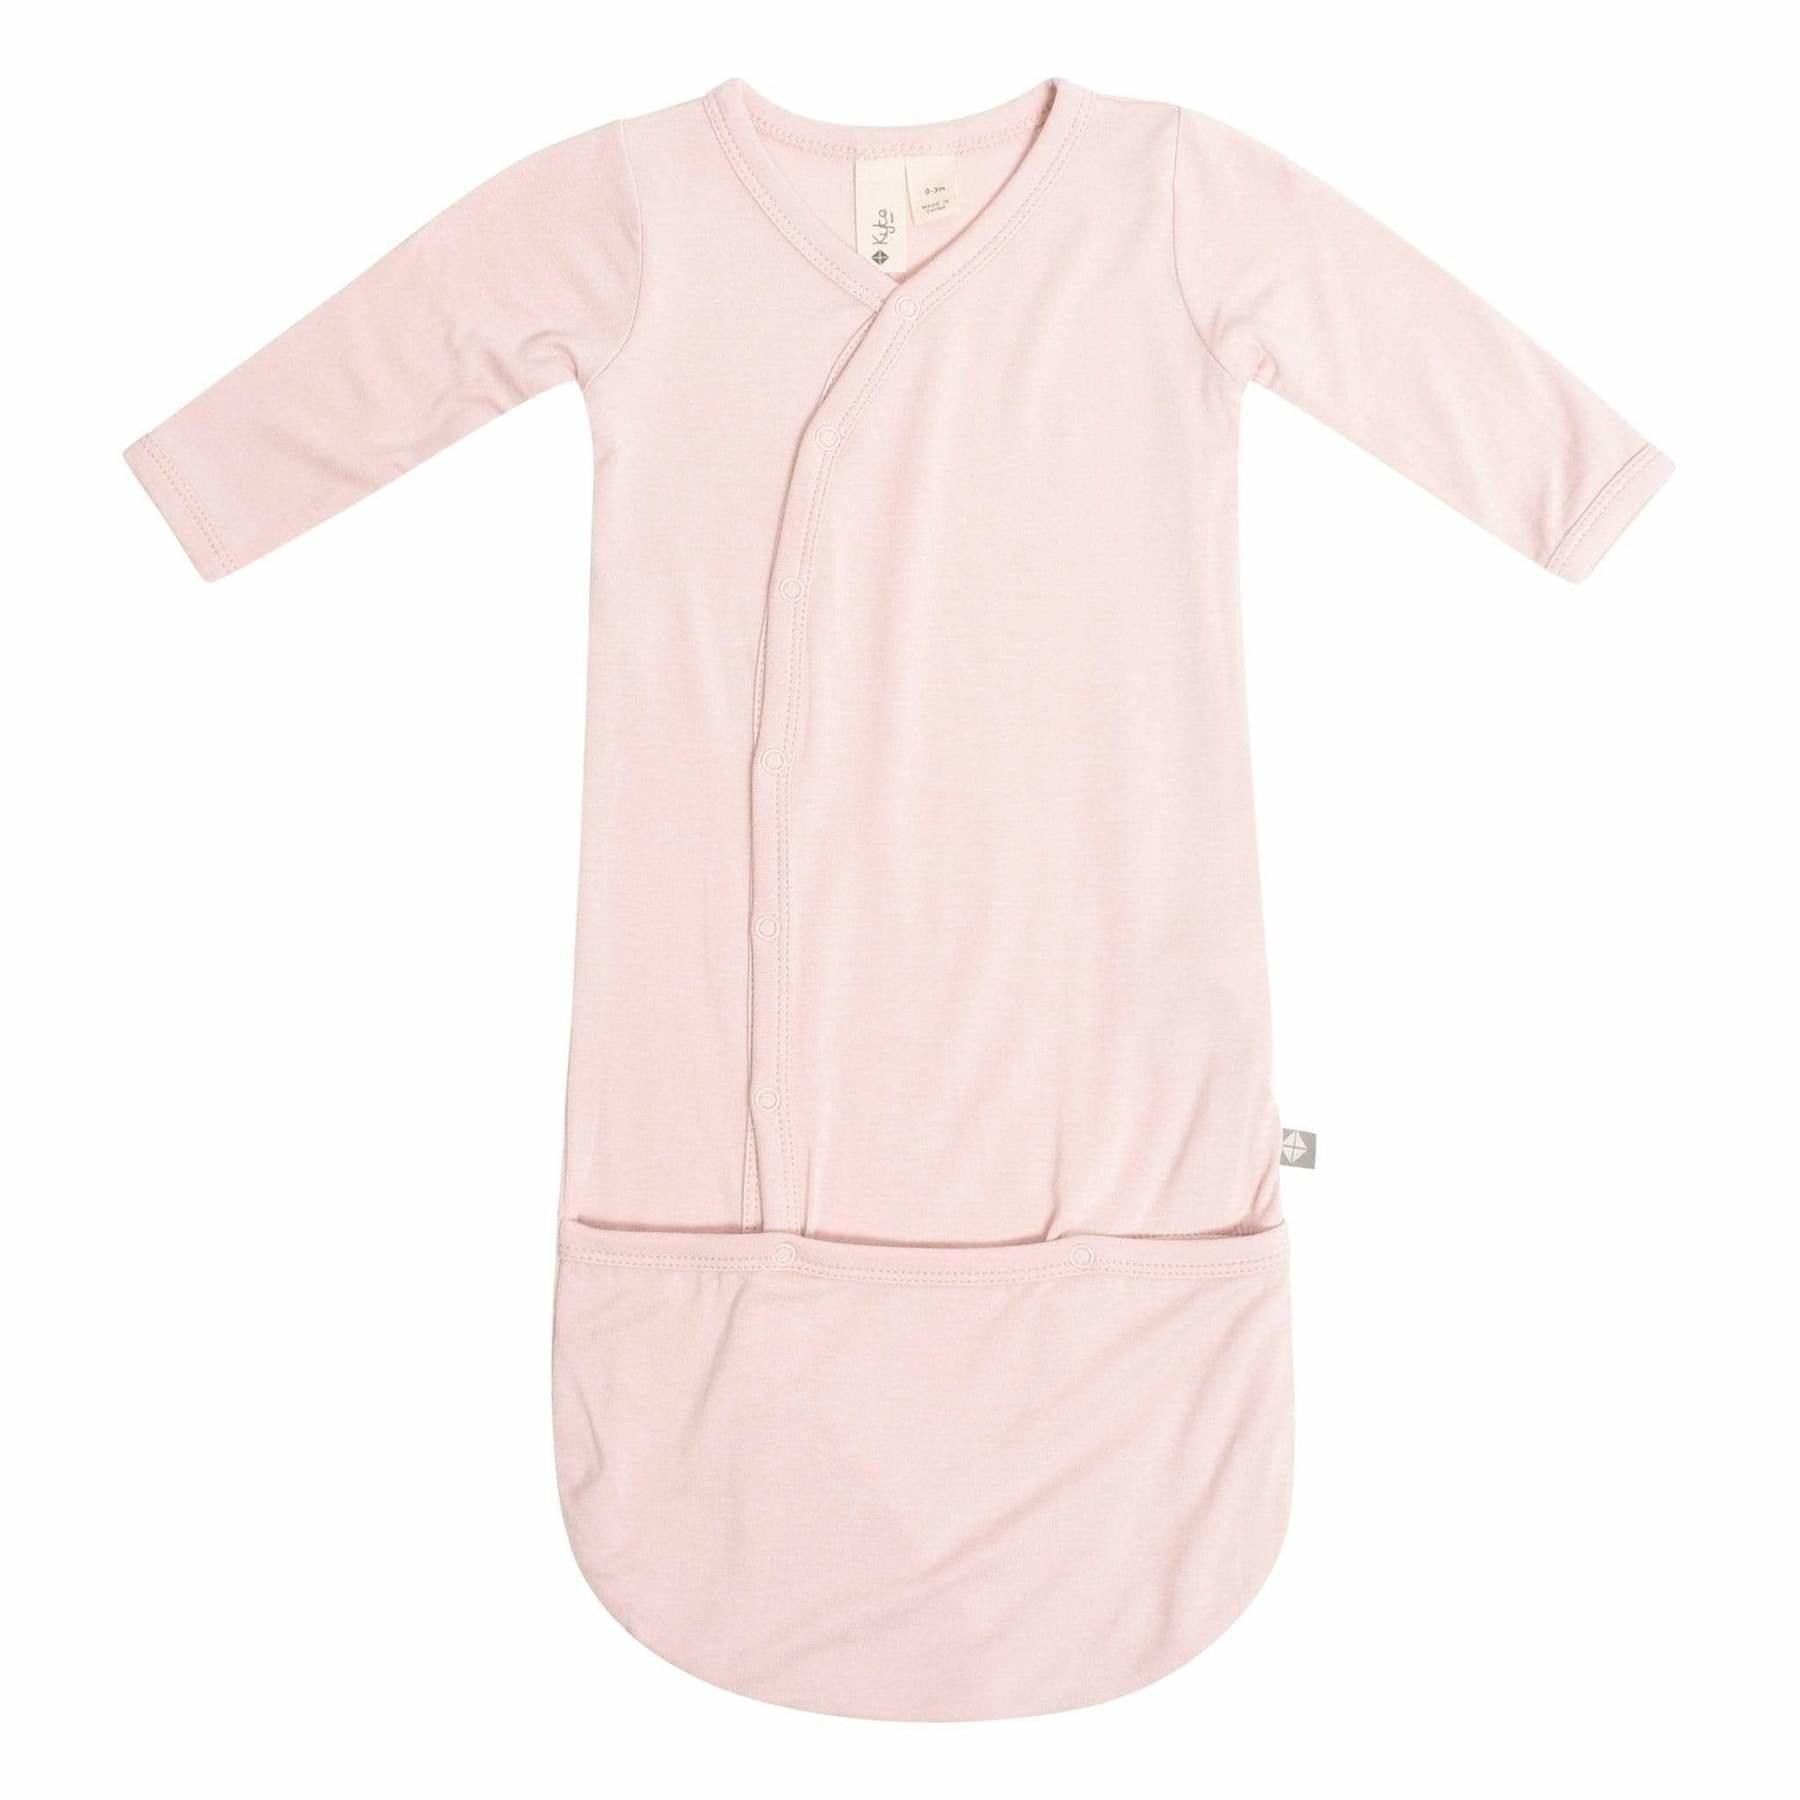 Kyte Baby Kyte Bamboo Bundler Sleeper Gown - Blush